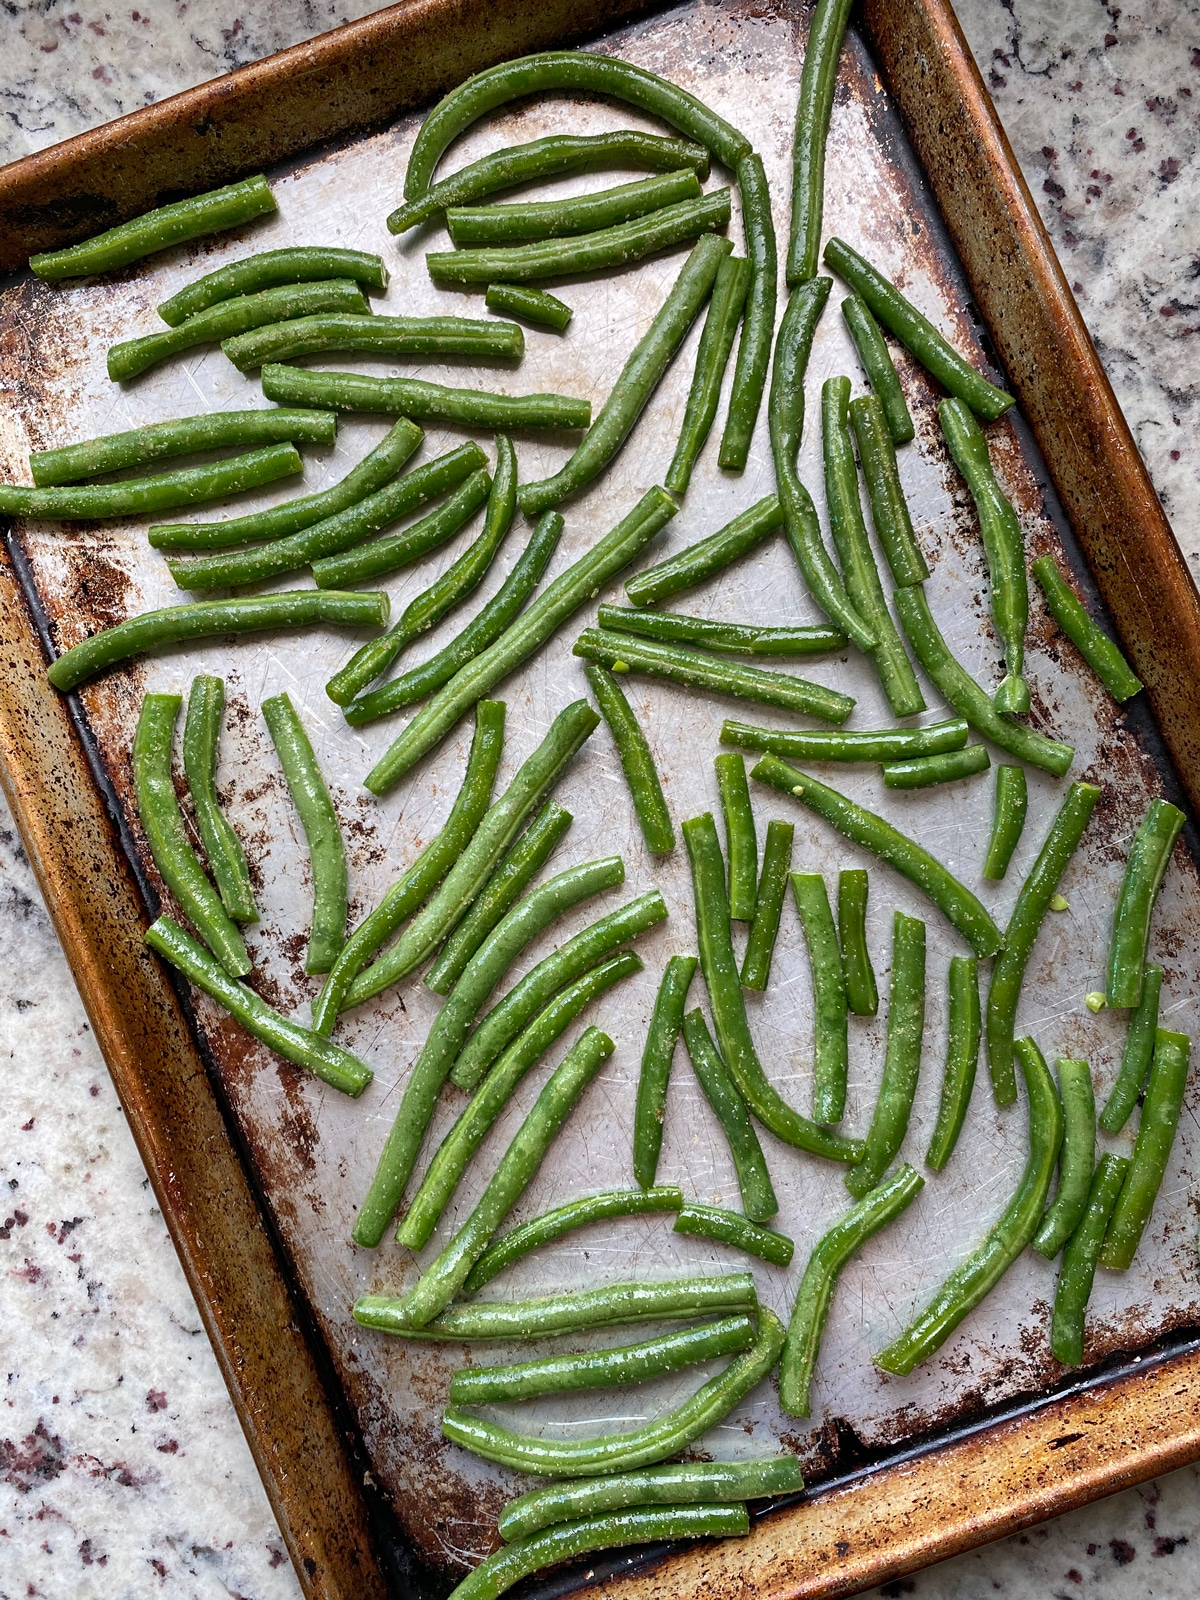 pre-baked beans